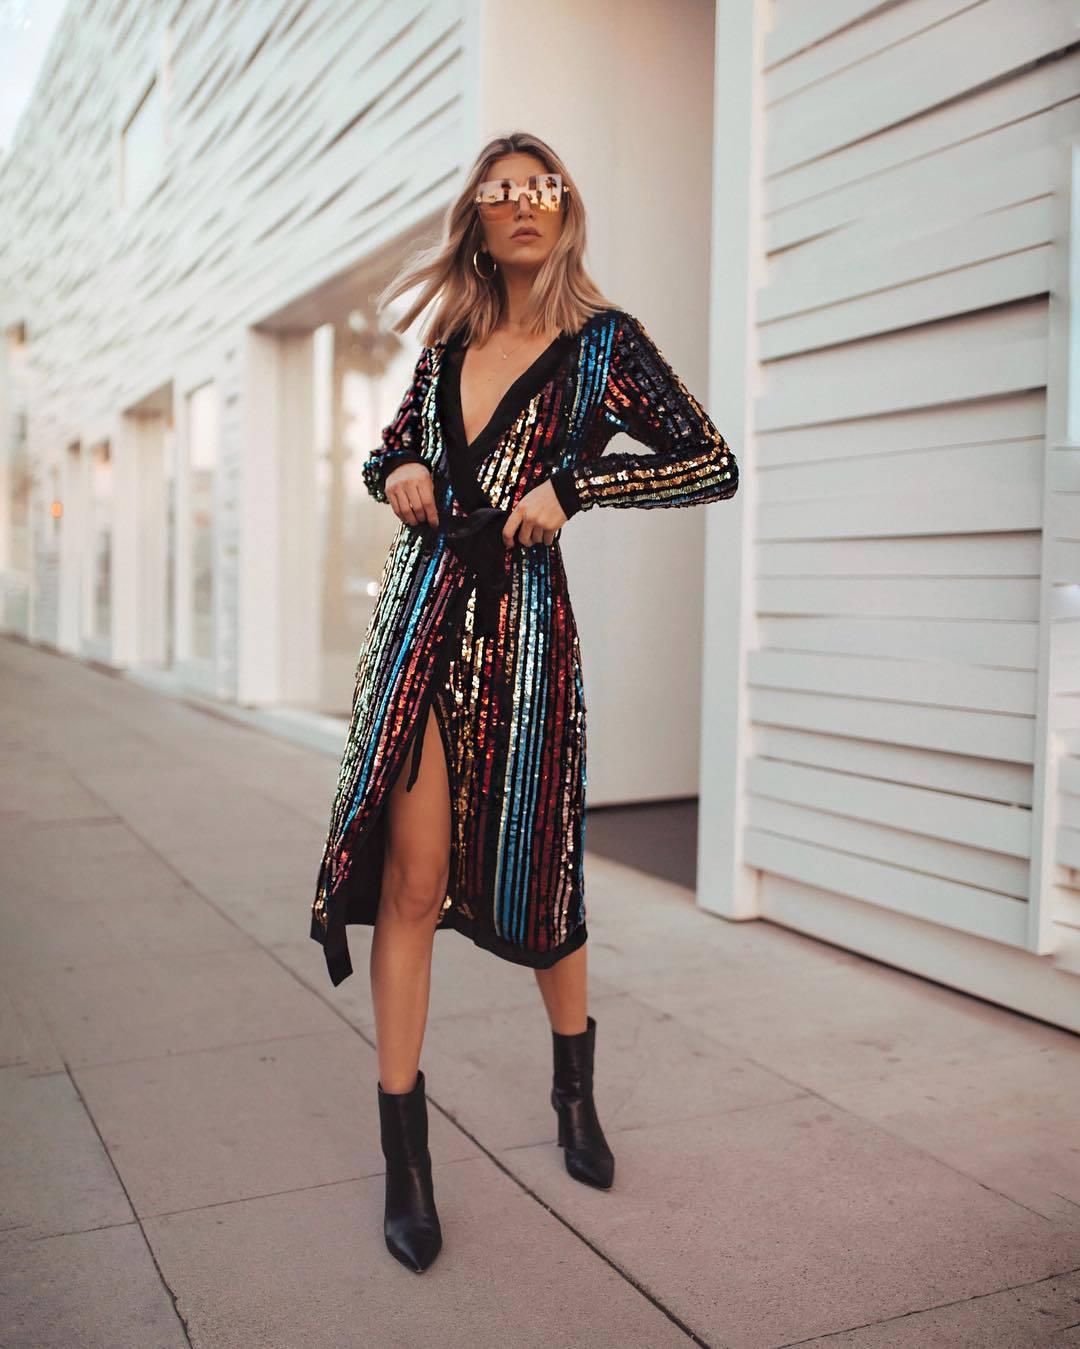 dress midi dress sequin dress long sleeve dress wrap dress black boots ankle boots heel boots